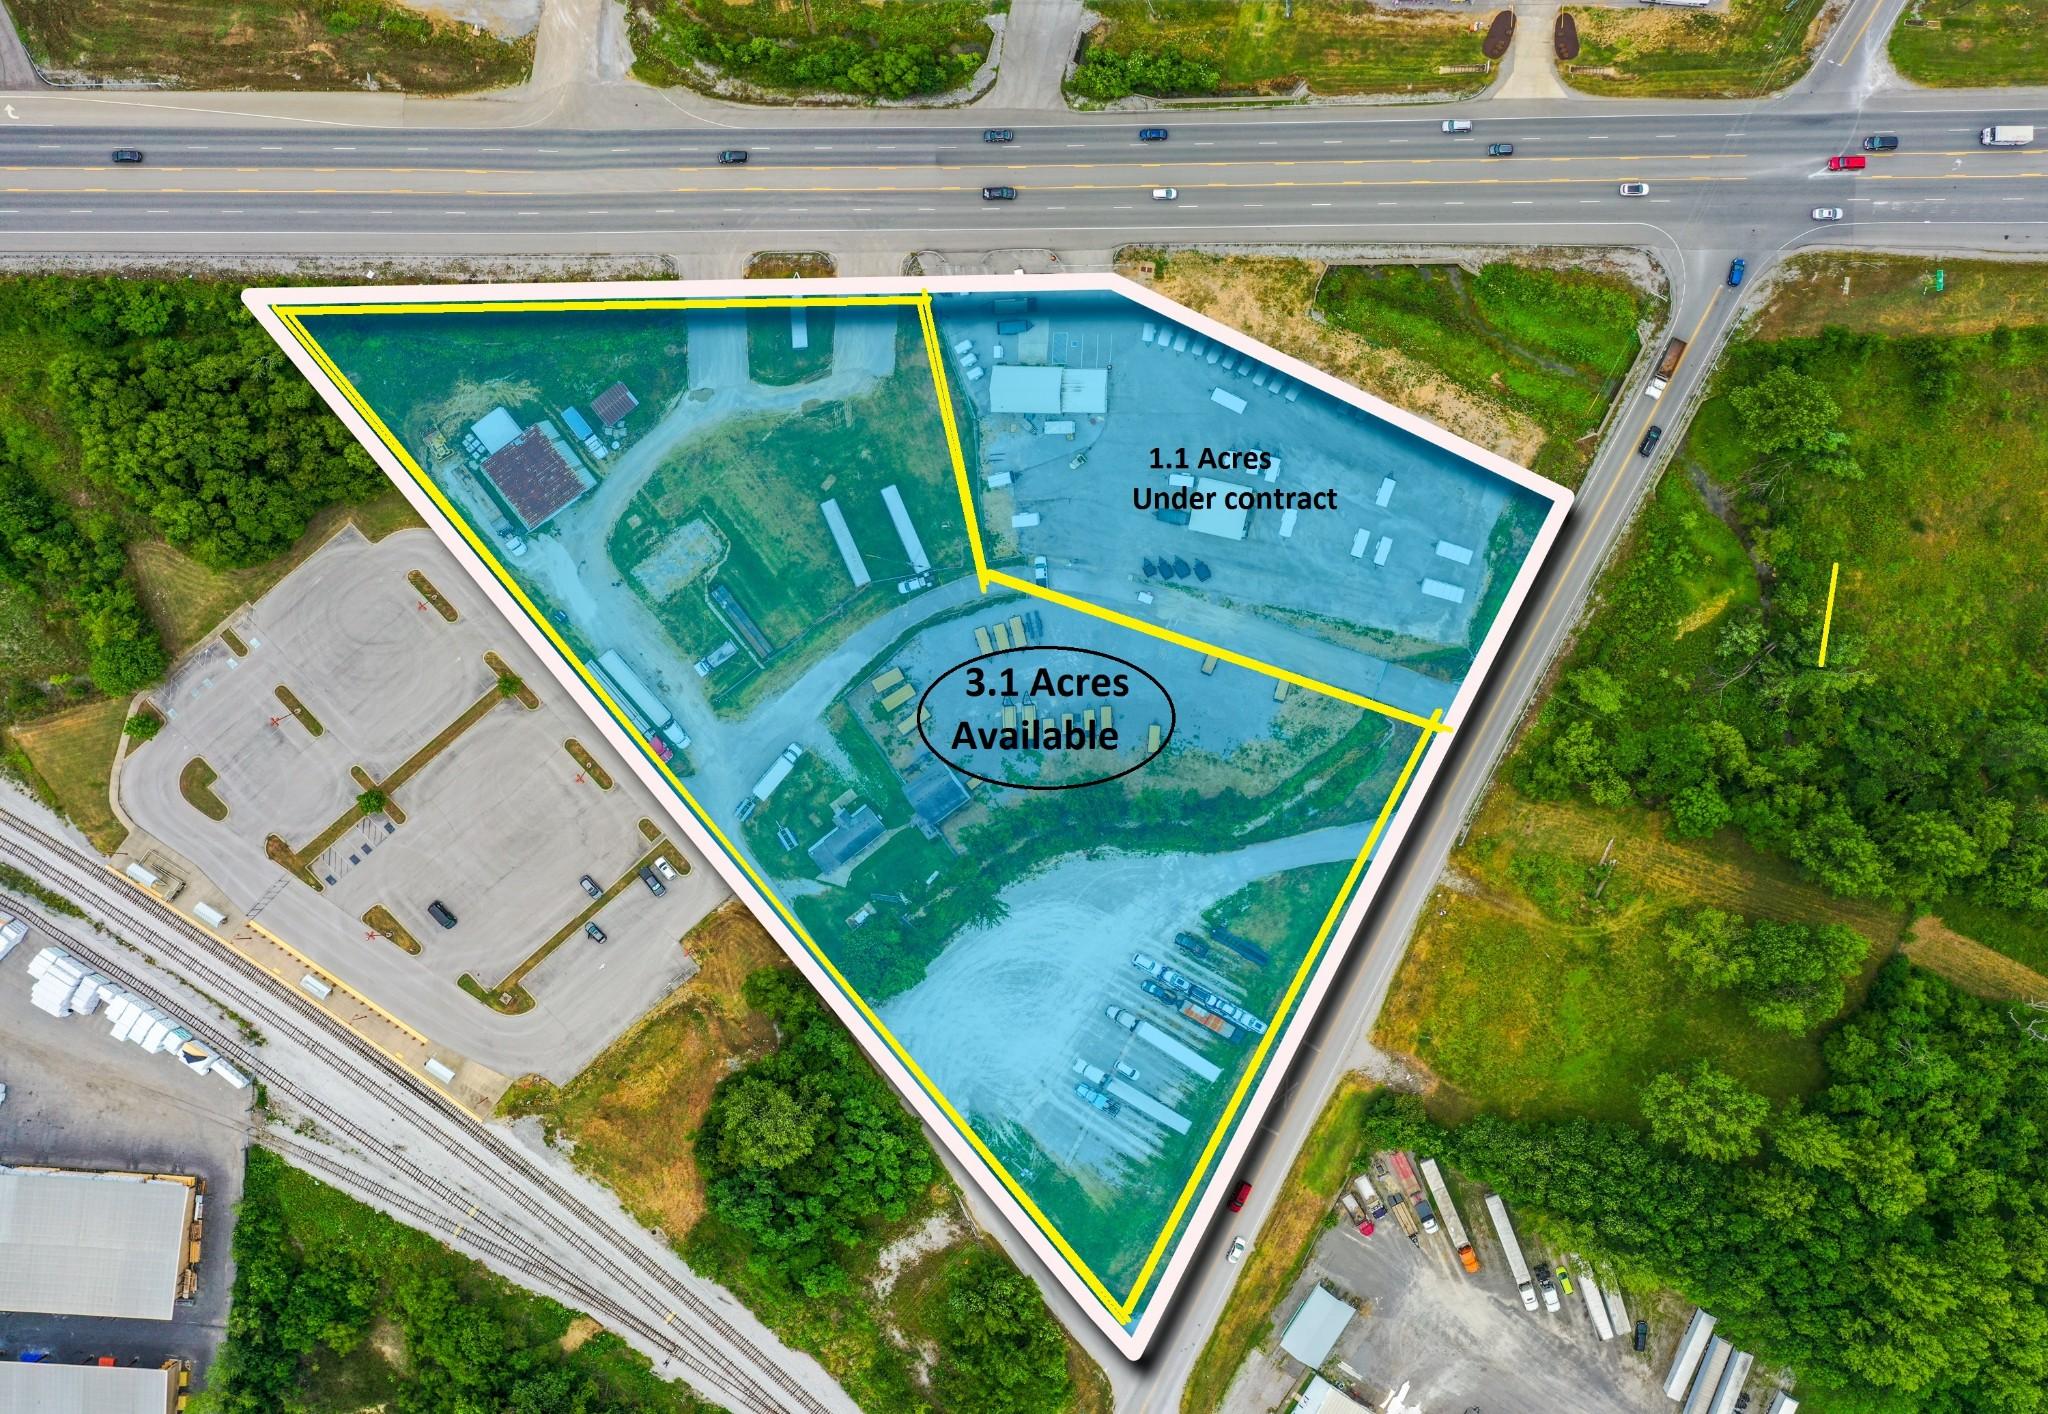 0 Hwy 109 North Property Photo - Lebanon, TN real estate listing